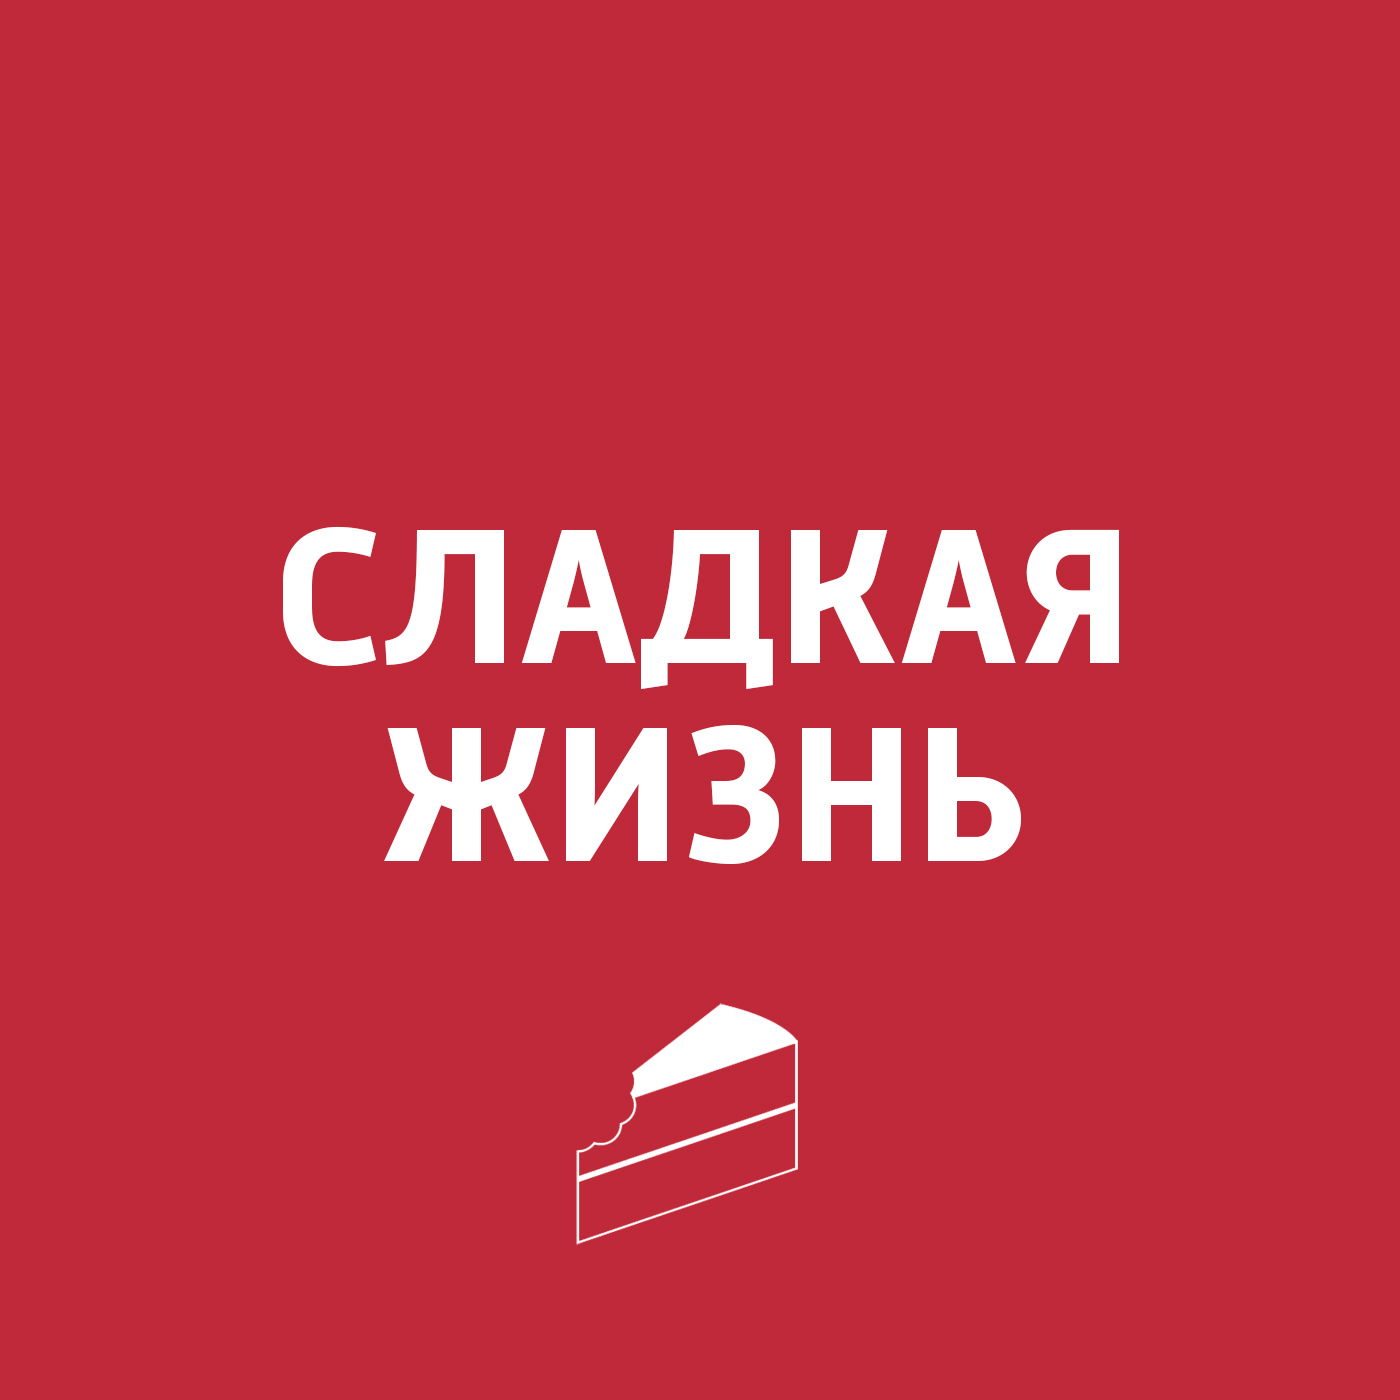 Картаев Павел Хворост корзина для жарки во фритюре redmond ram fb1